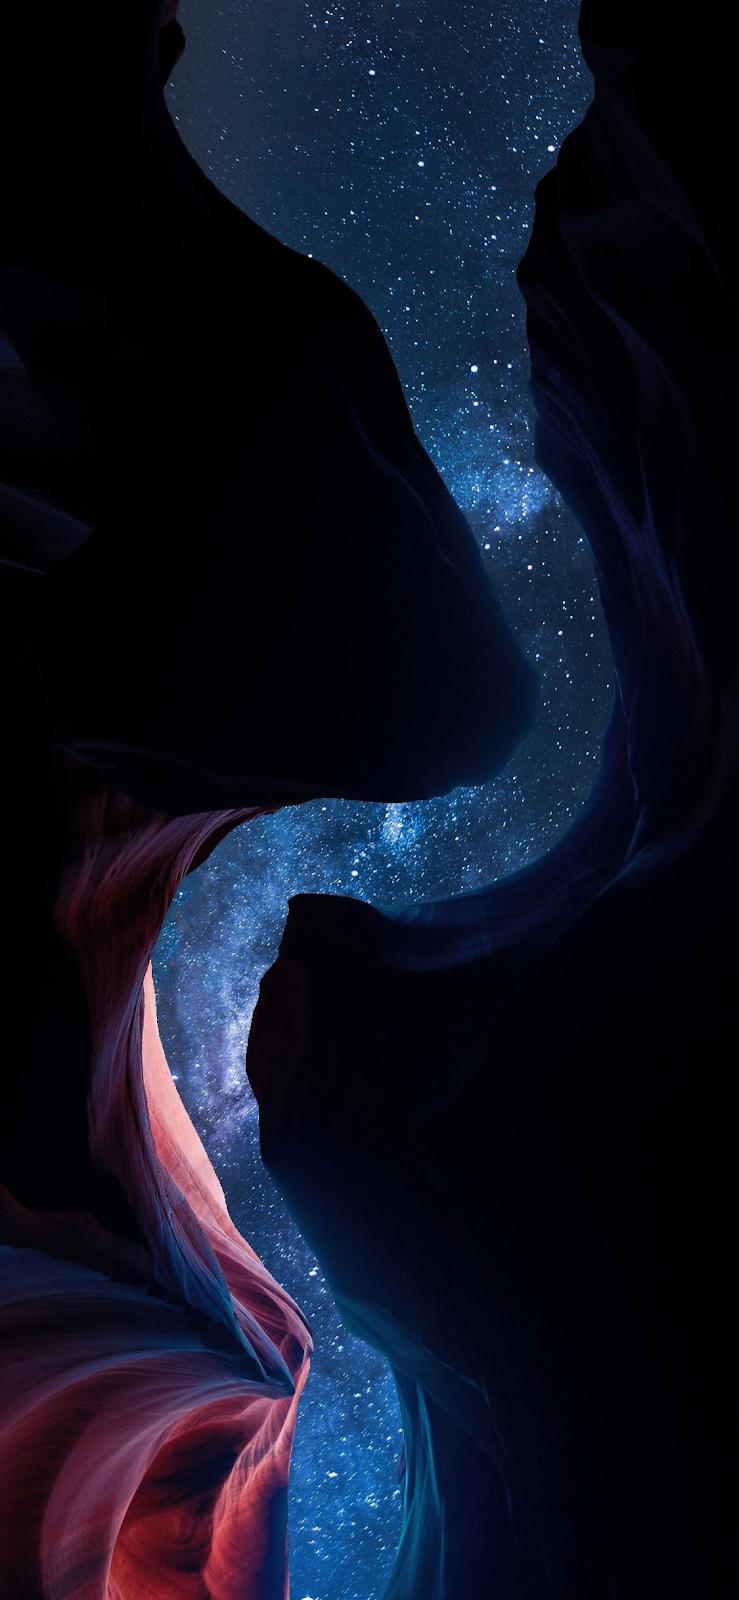 Under the starry night